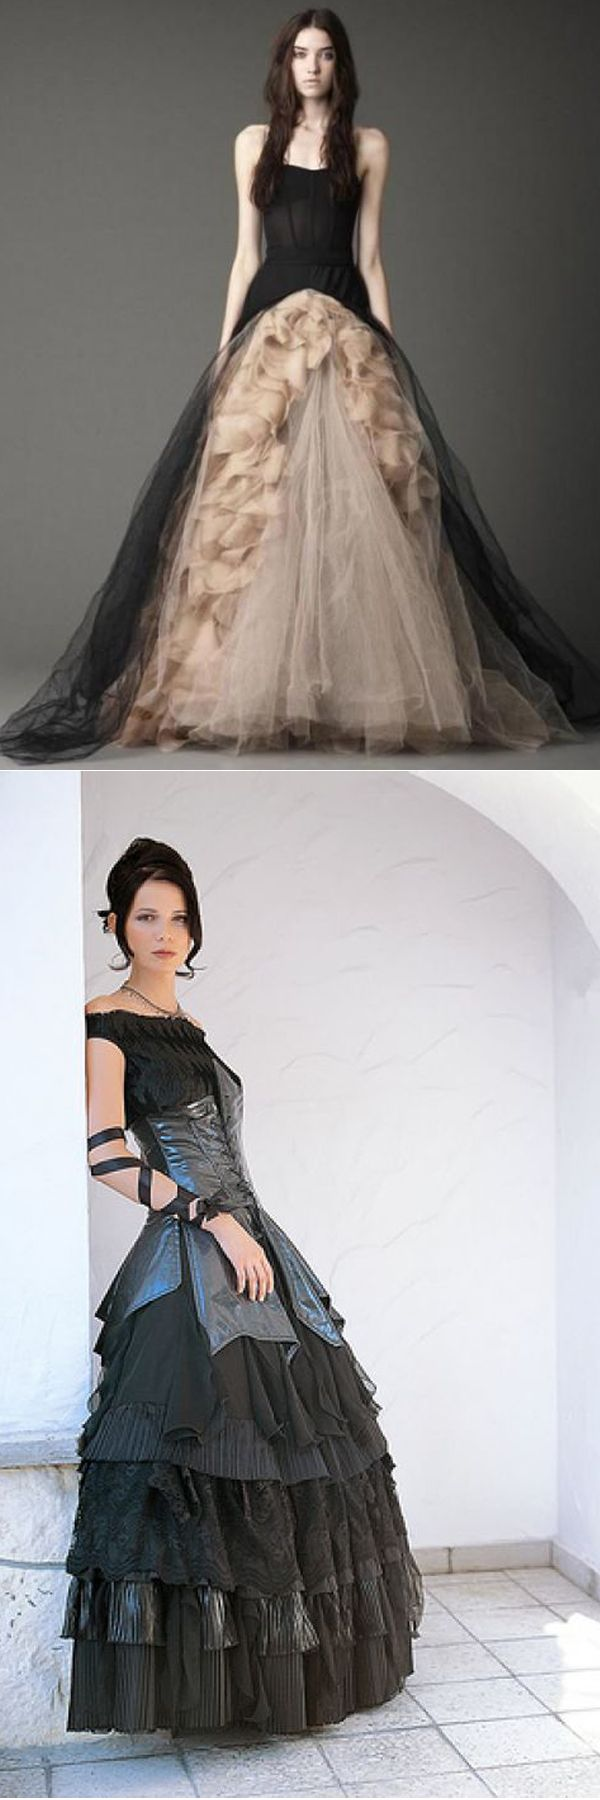 21 Fabulous Gothic Wedding Dress Ideas   Victorian gothic wedding ...